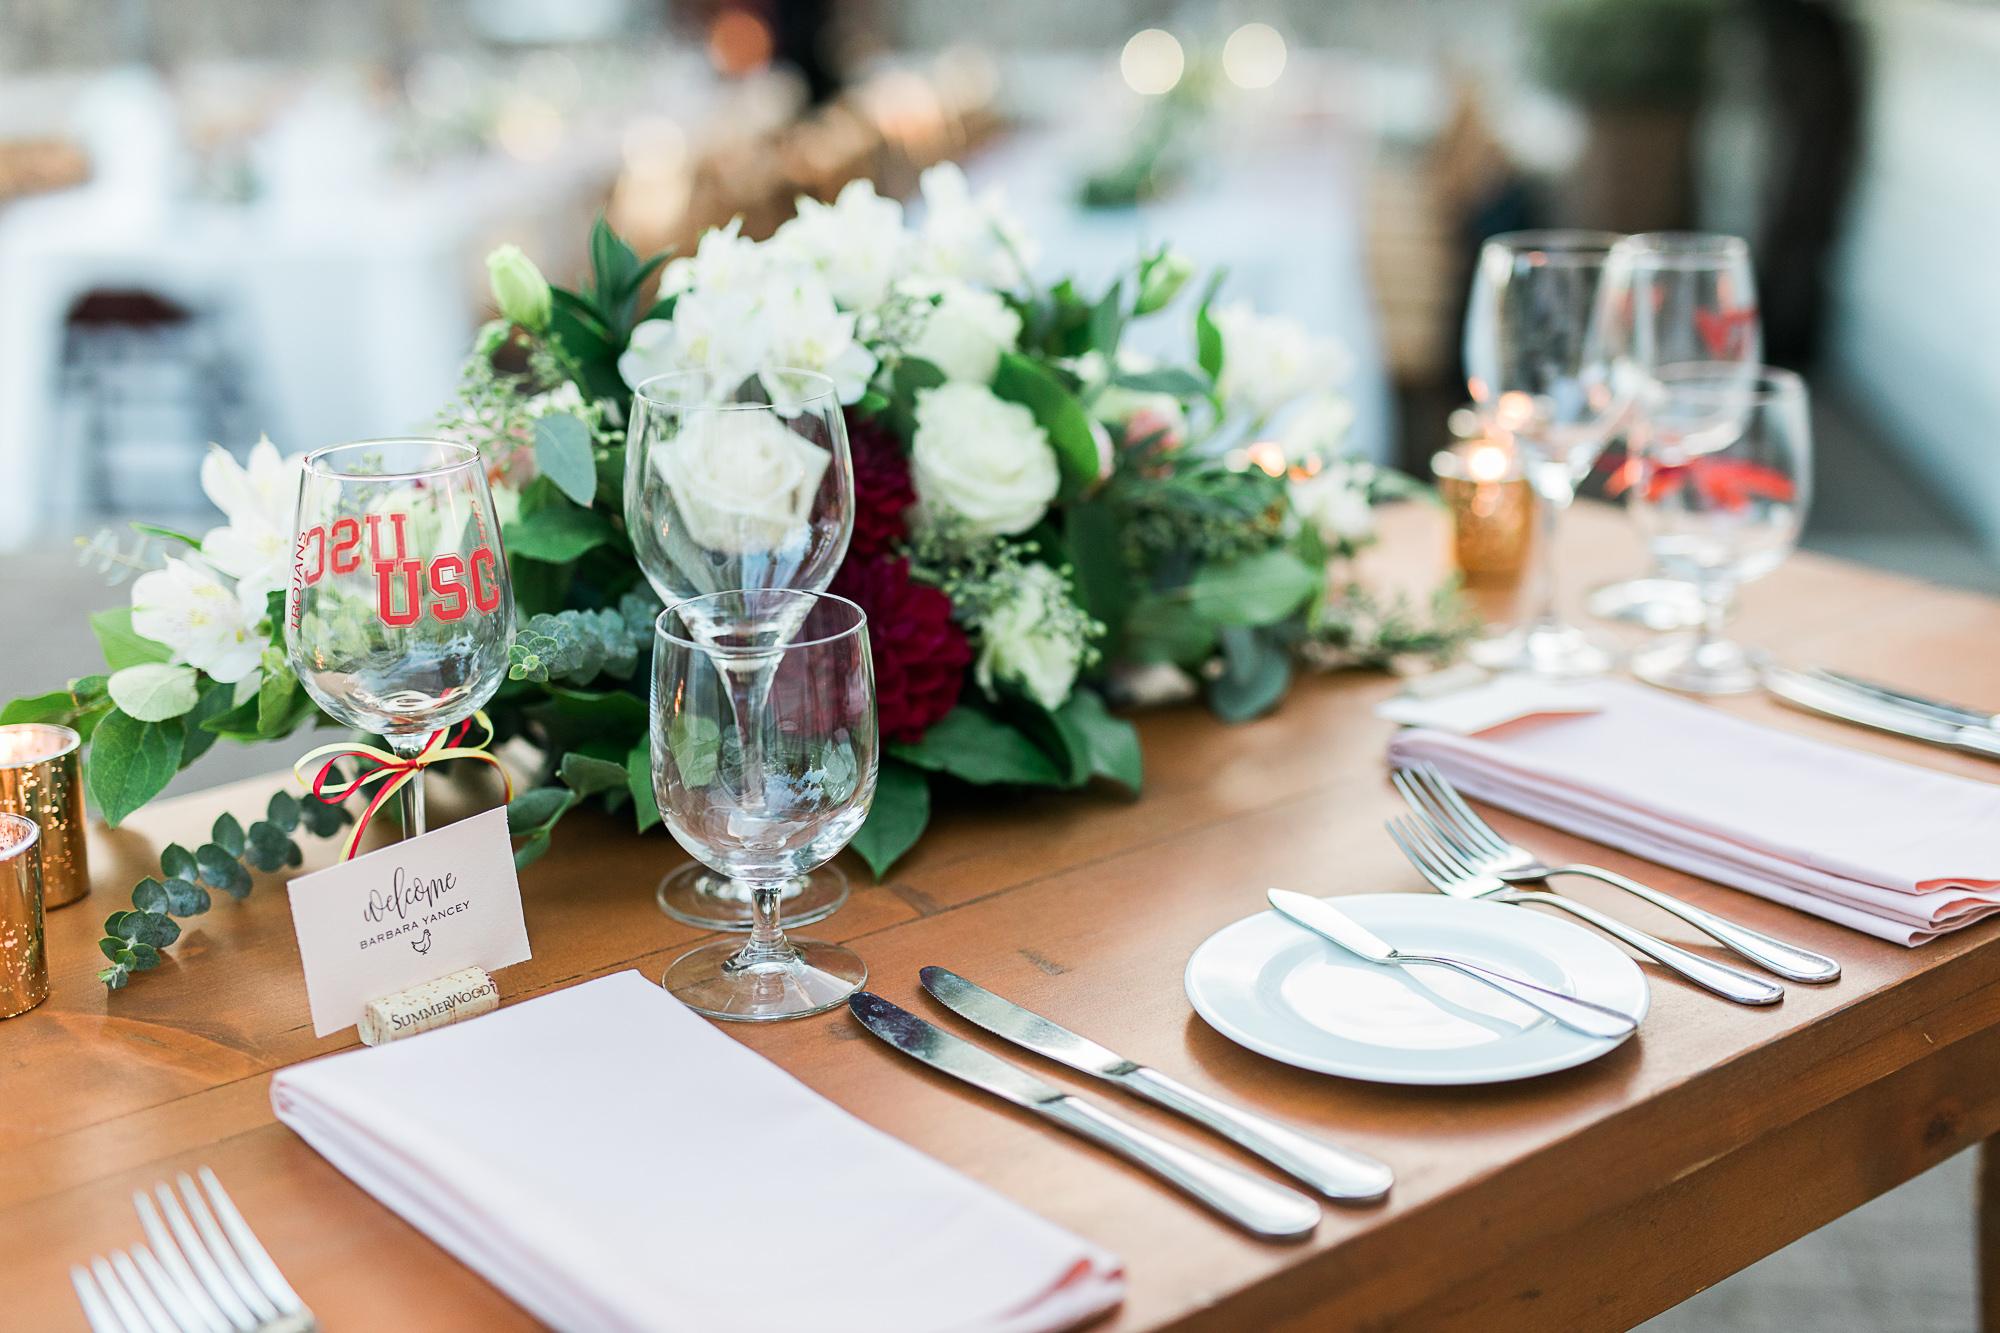 Generals+Daughter+Wedding+Photos+by+JBJ+Pictures+-+Ramekins+Wedding+Venue+Photographer+in+Sonoma+Napa+(37).jpg